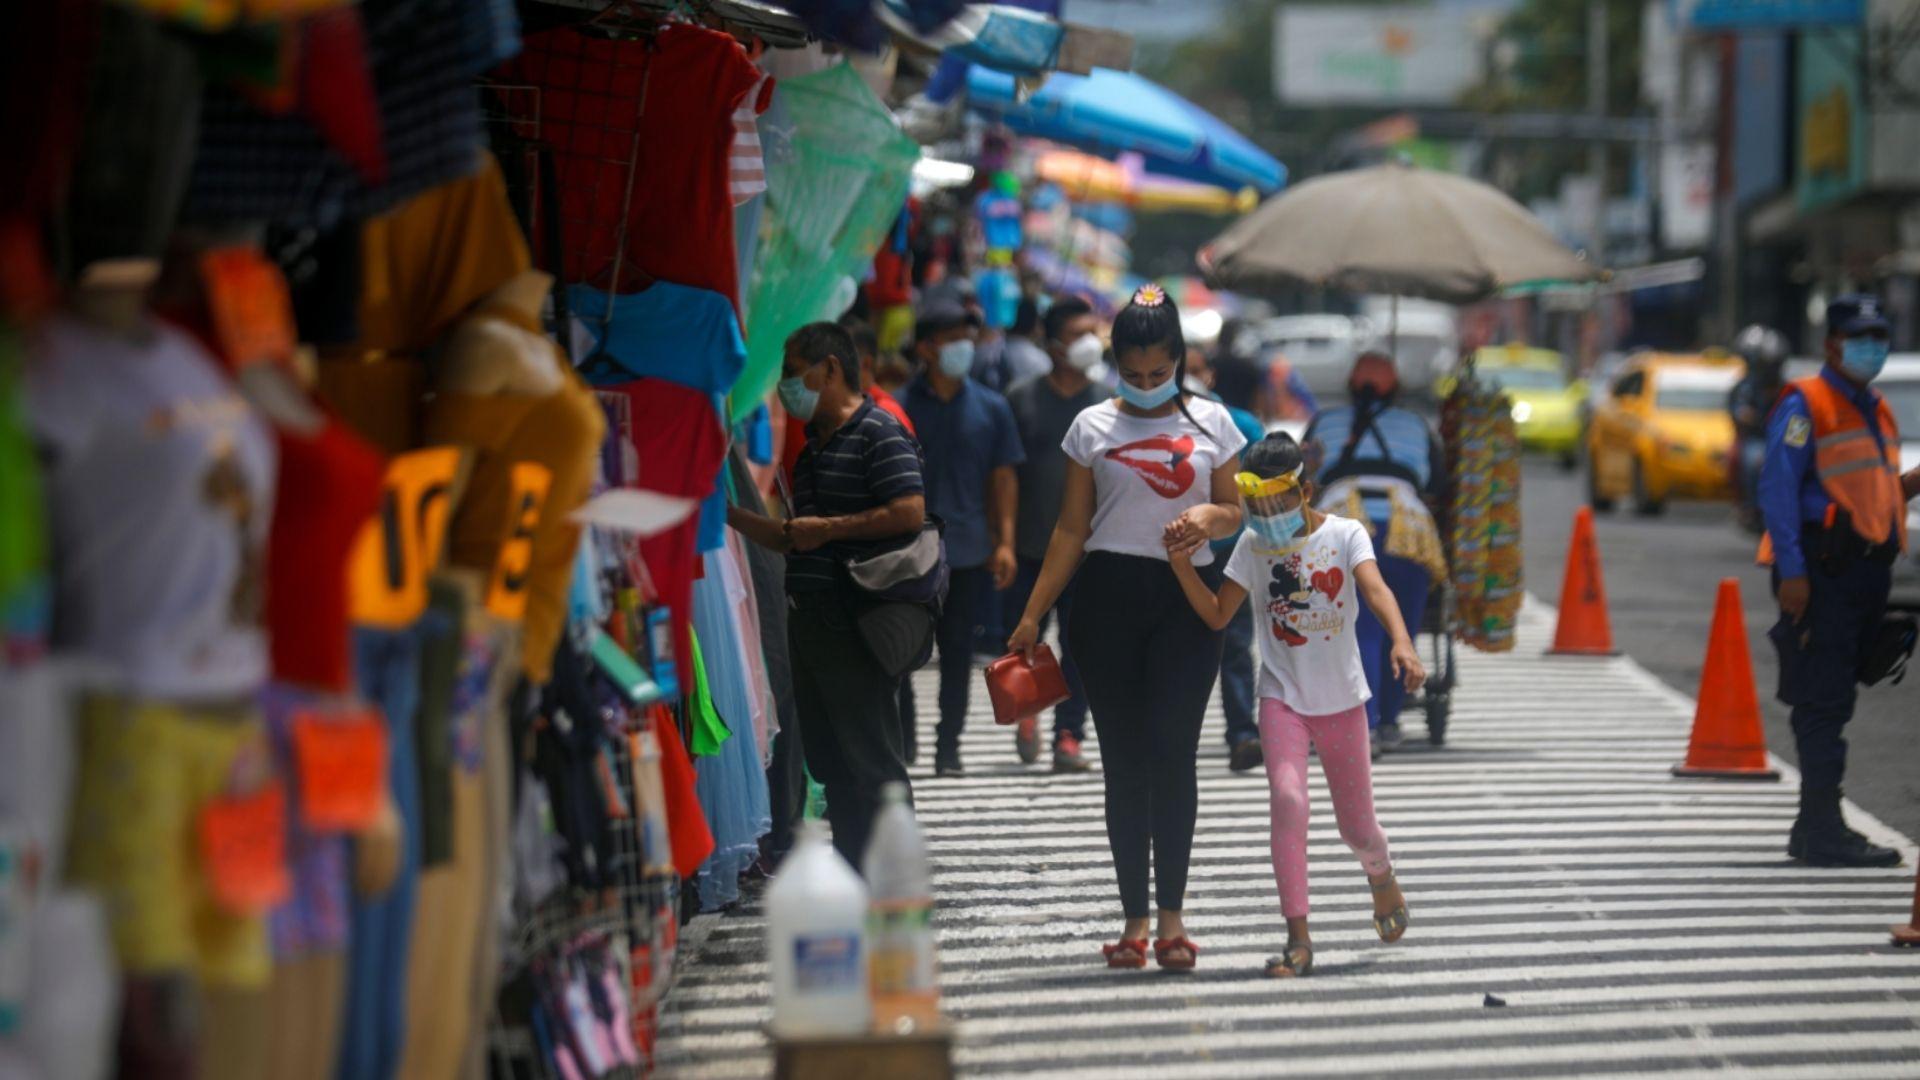 Cepal: Nivel de pobreza en Latinoamérica aumentó por COVID-19